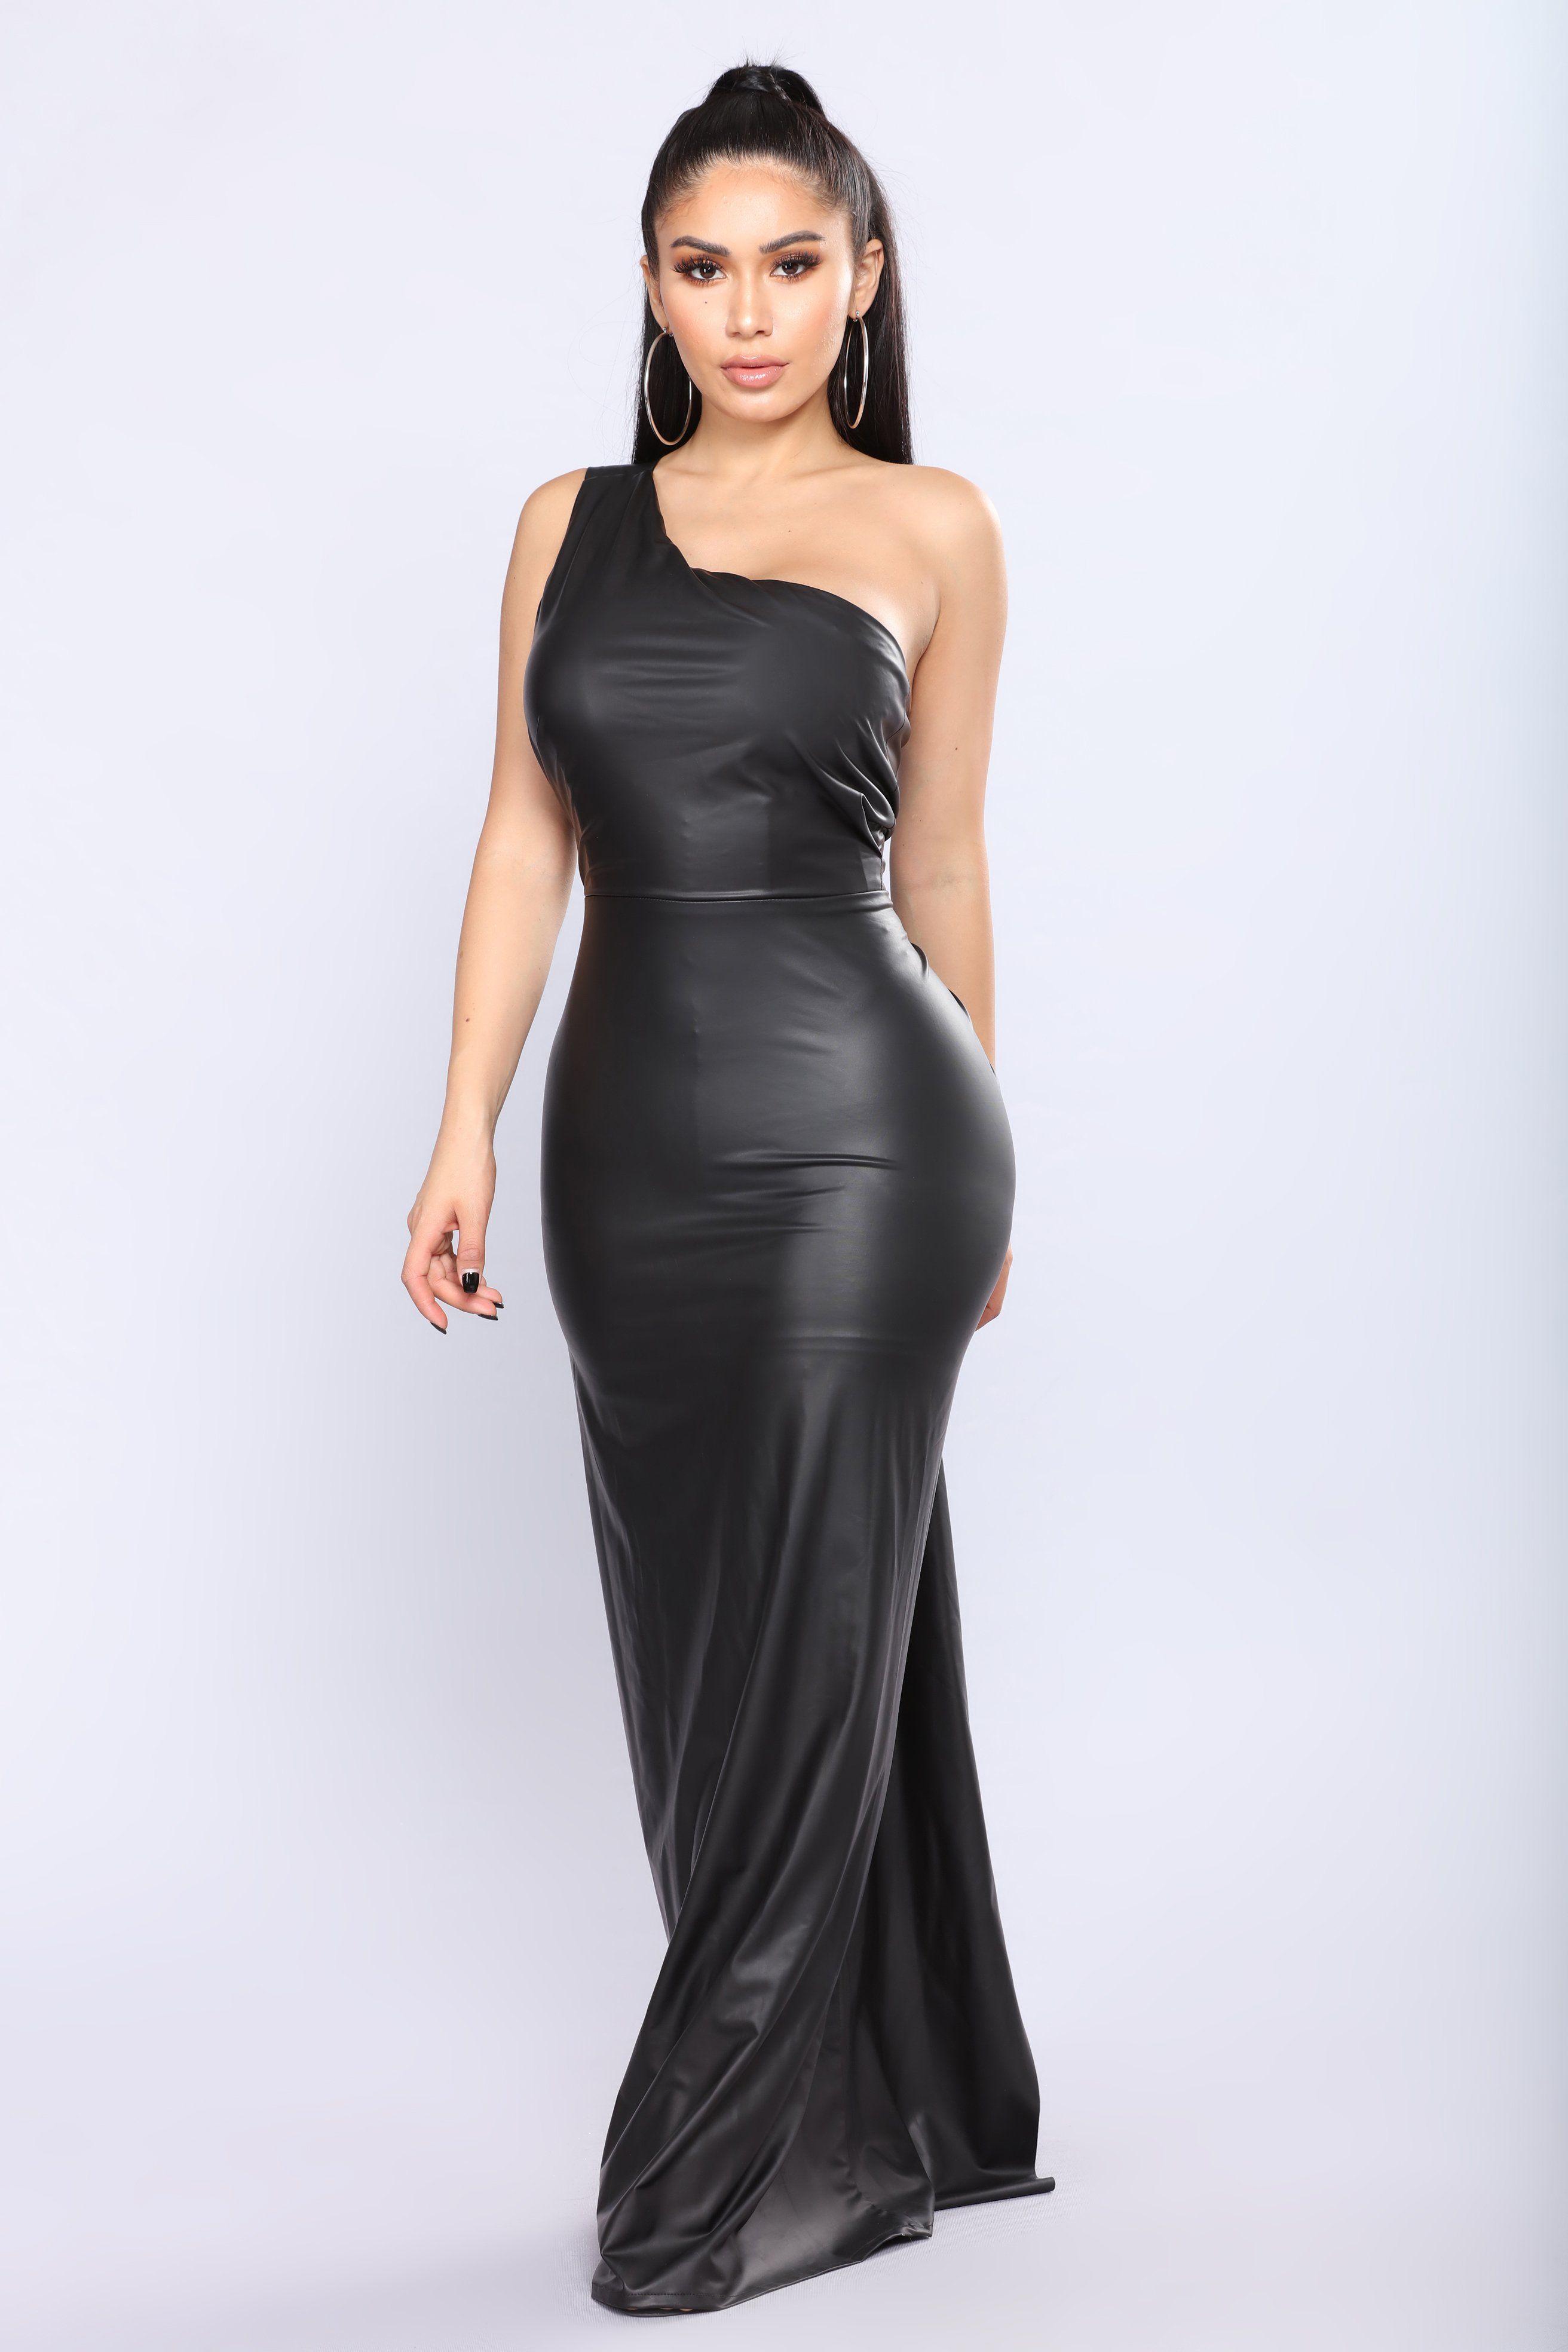 Women's Clothing 2018 Women New Womens Locomotive V-neck Pu Leather Harness Dress Women Fashion Casual Slim Leather Dress